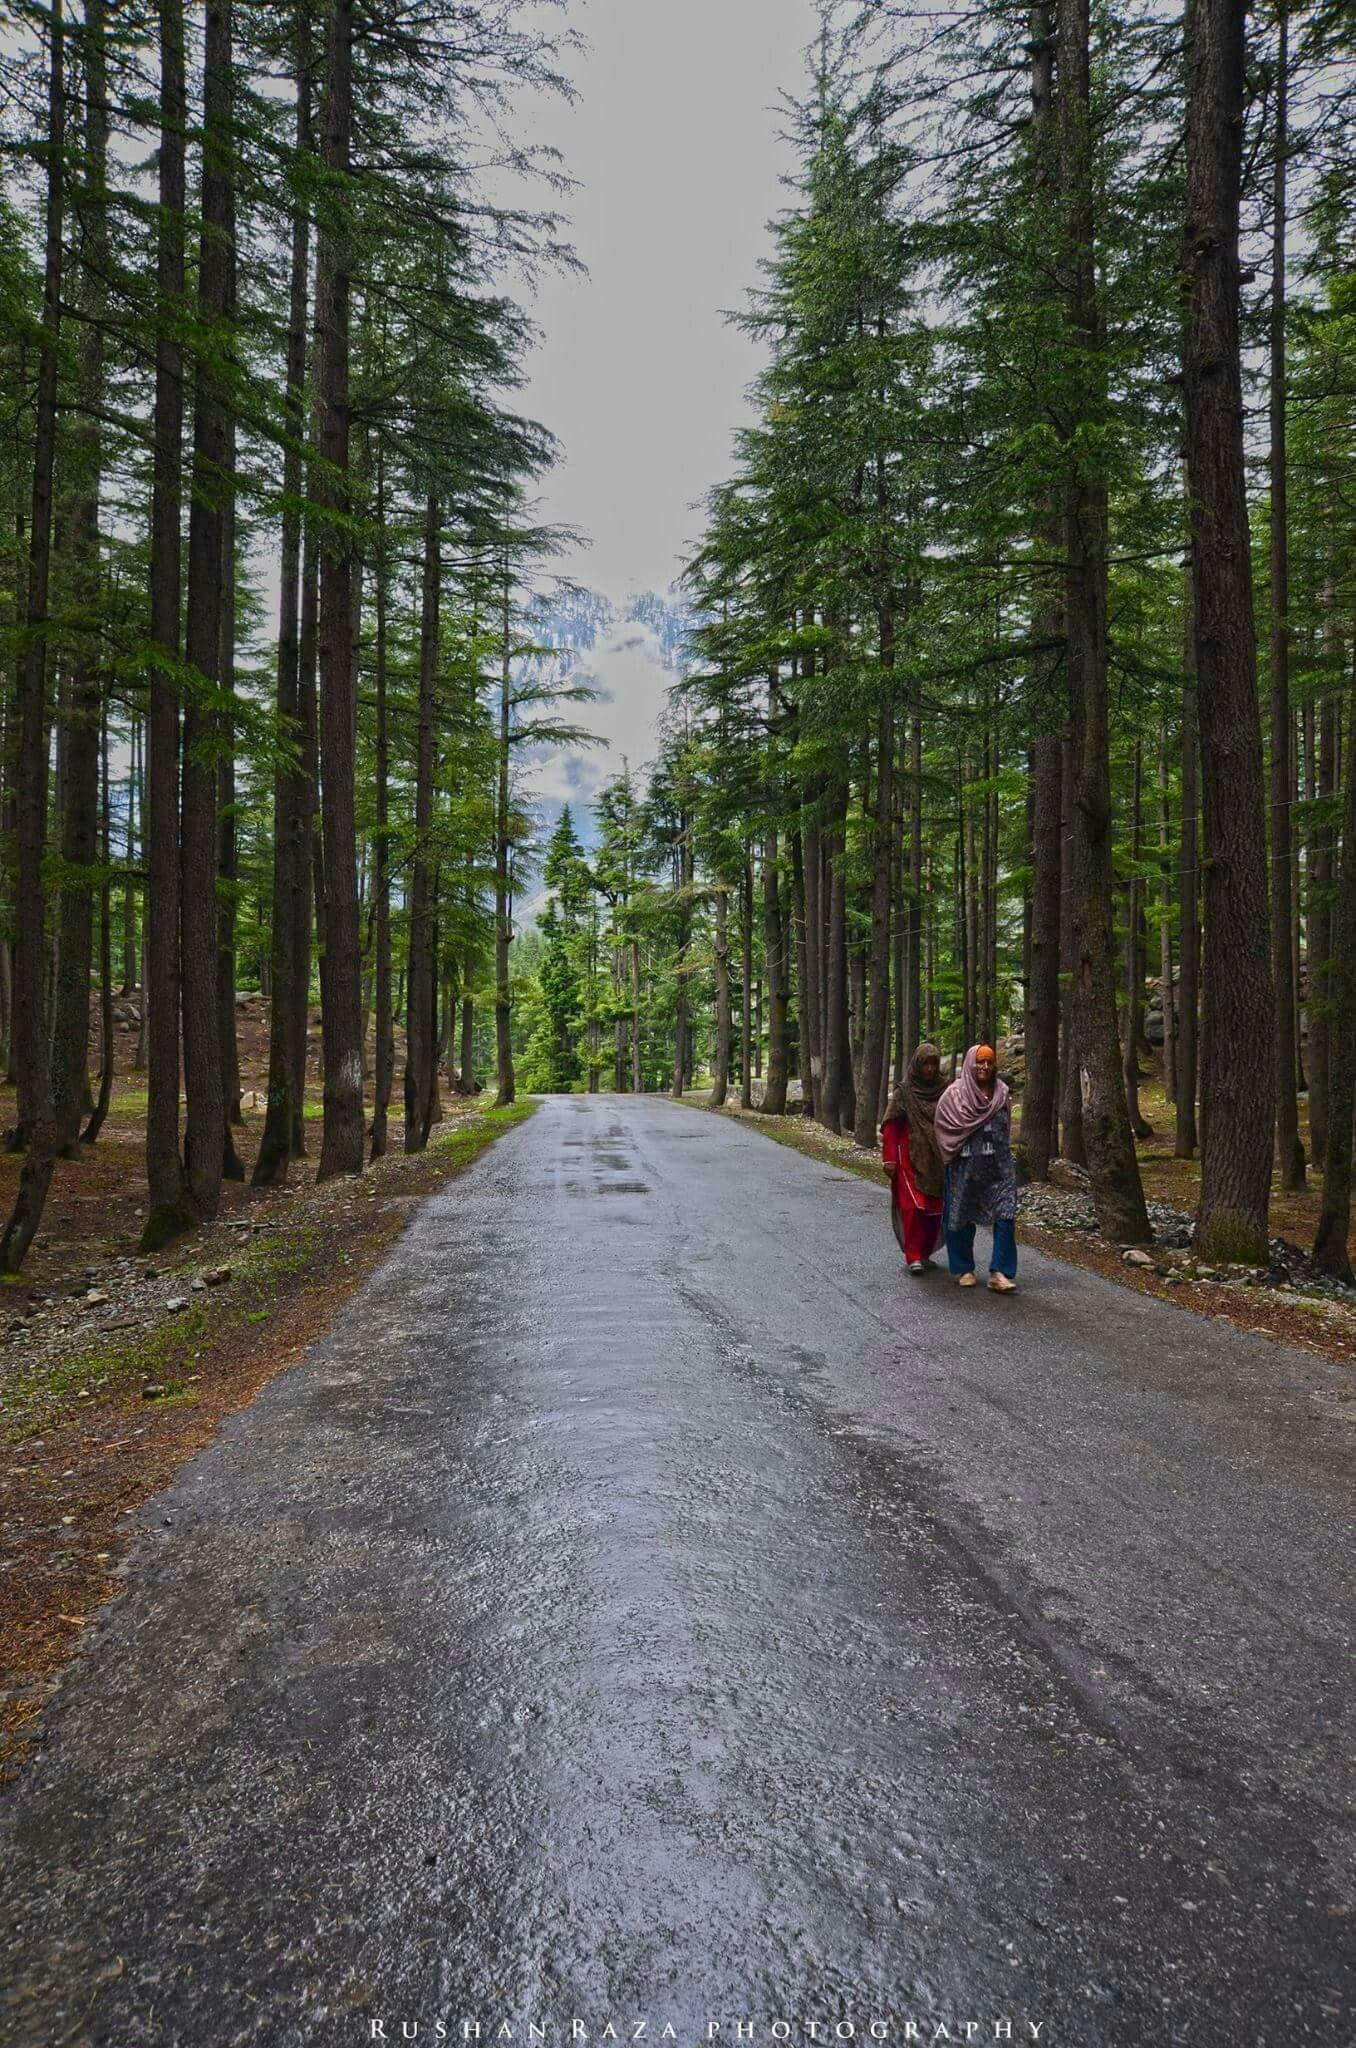 way to kalam swat valley pakistan pakistan pinterest